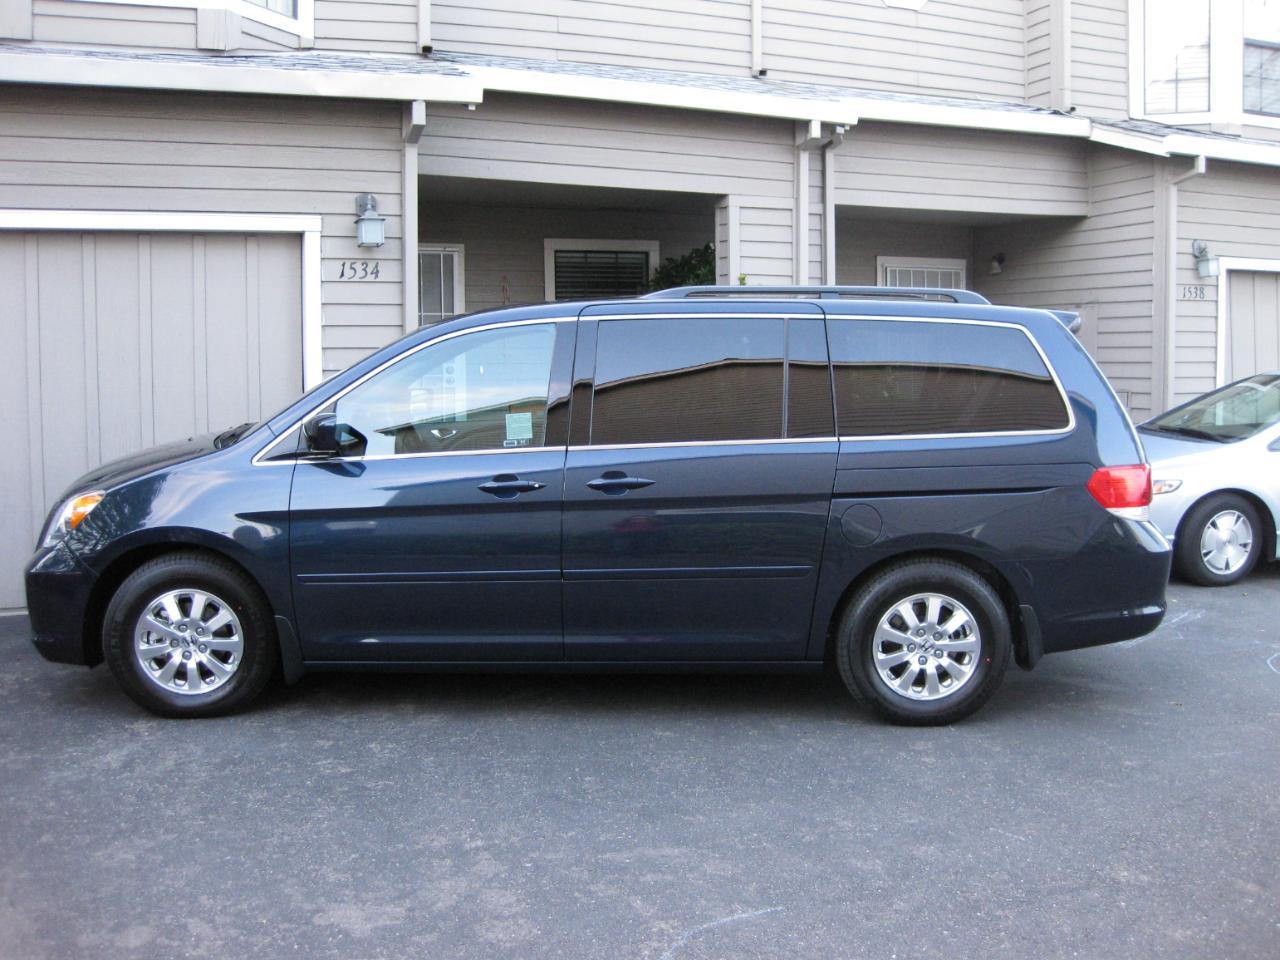 It's a Minivan